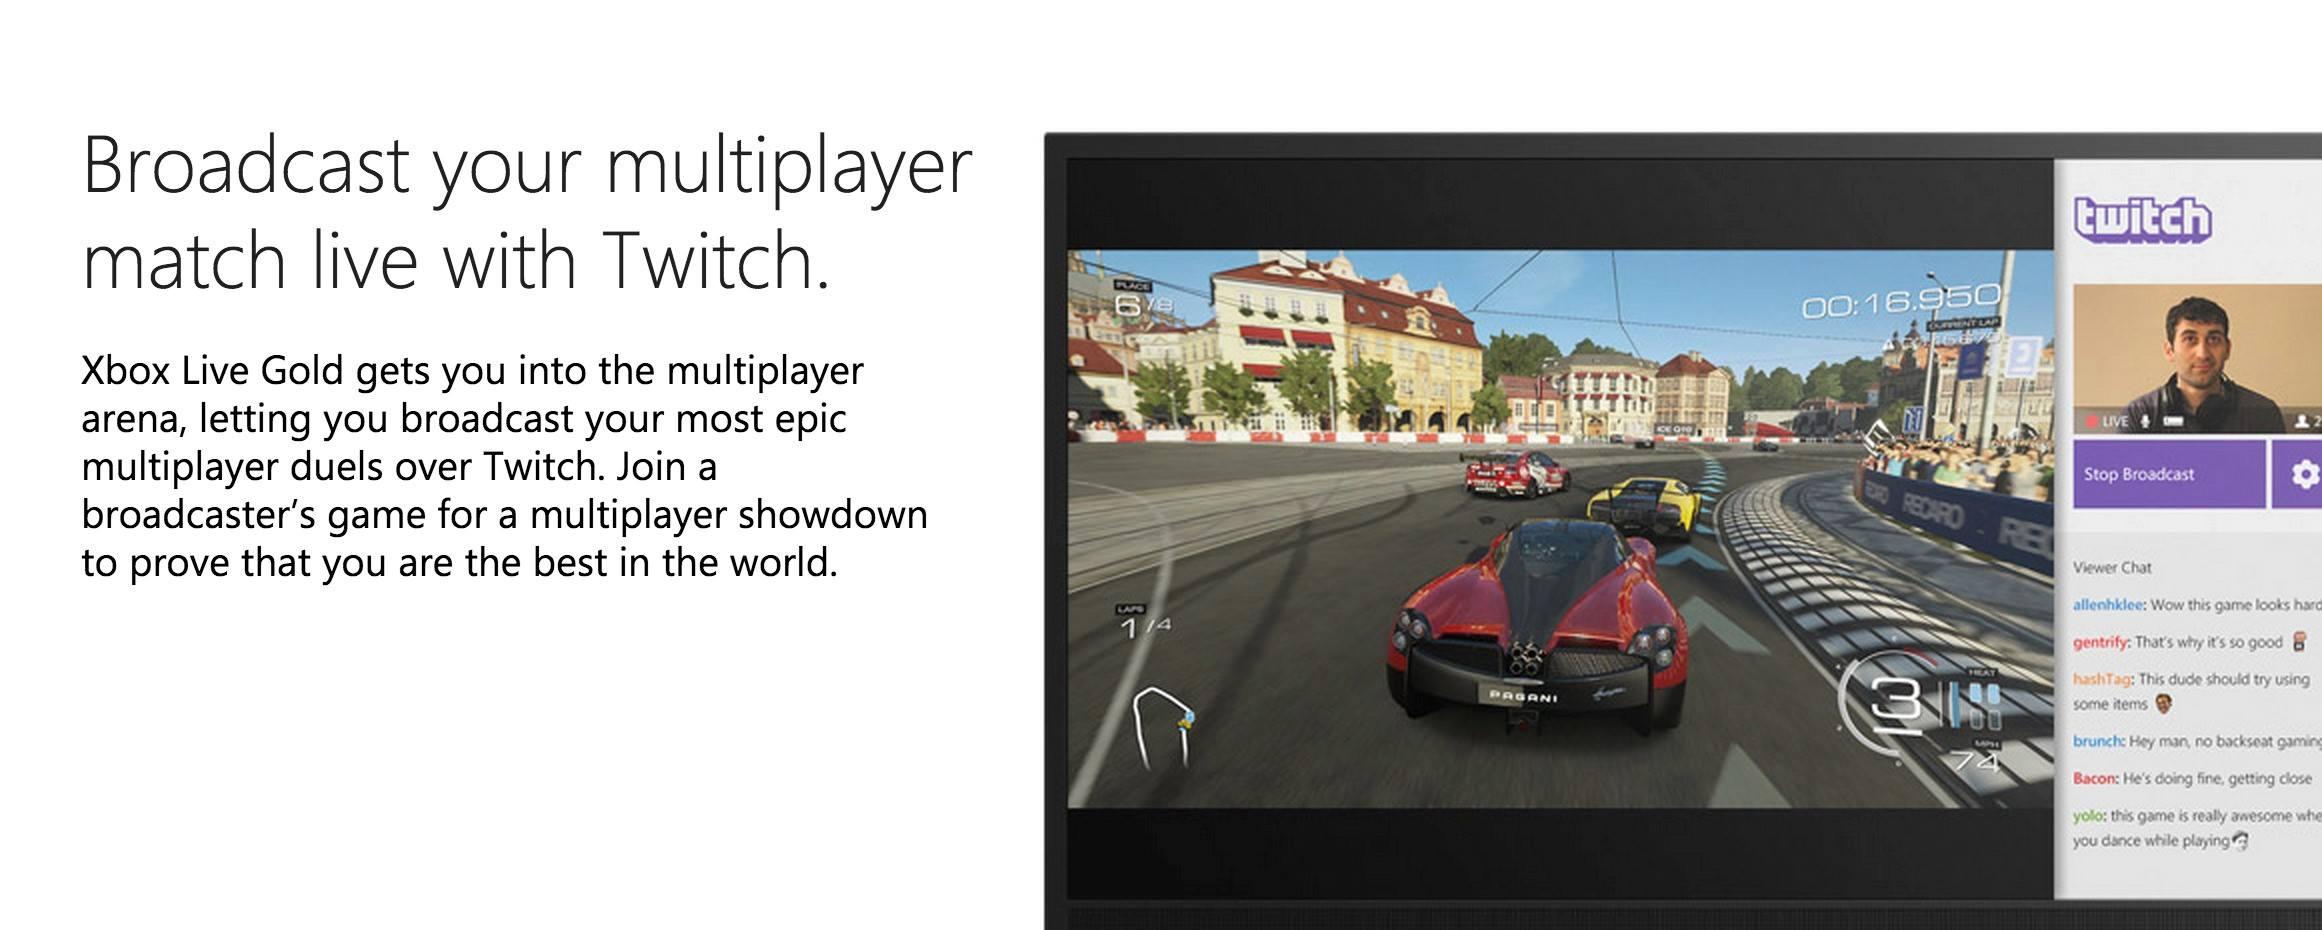 captura_pantalla Xbox Live_4